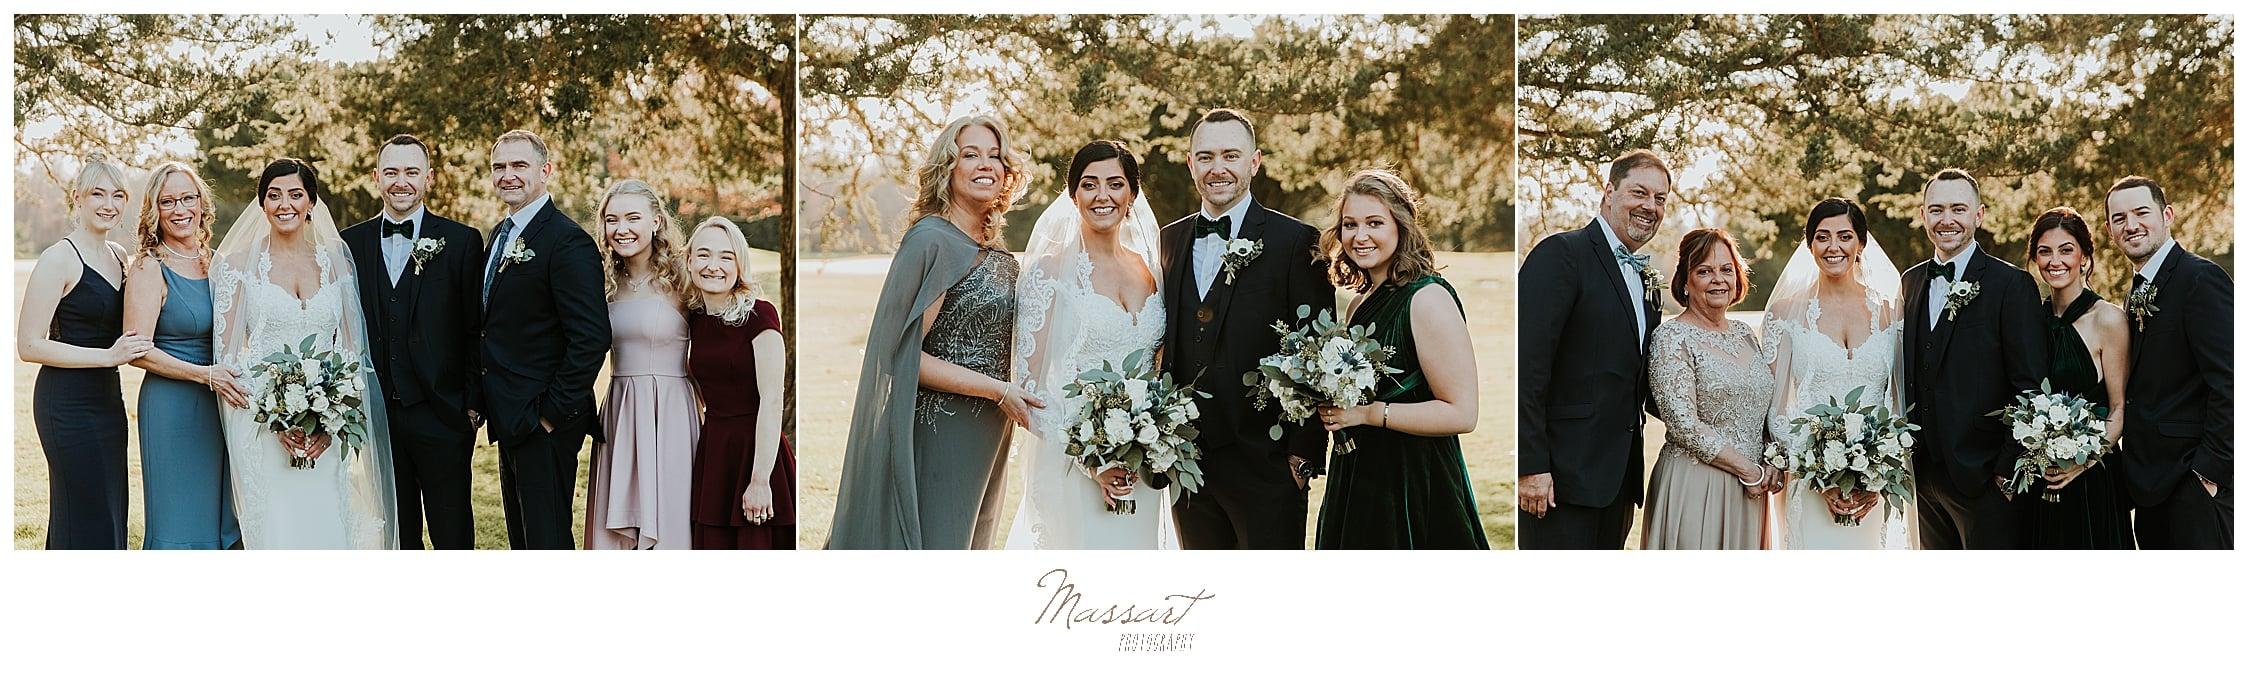 family portraits in Foxboro MA with Massart Photography